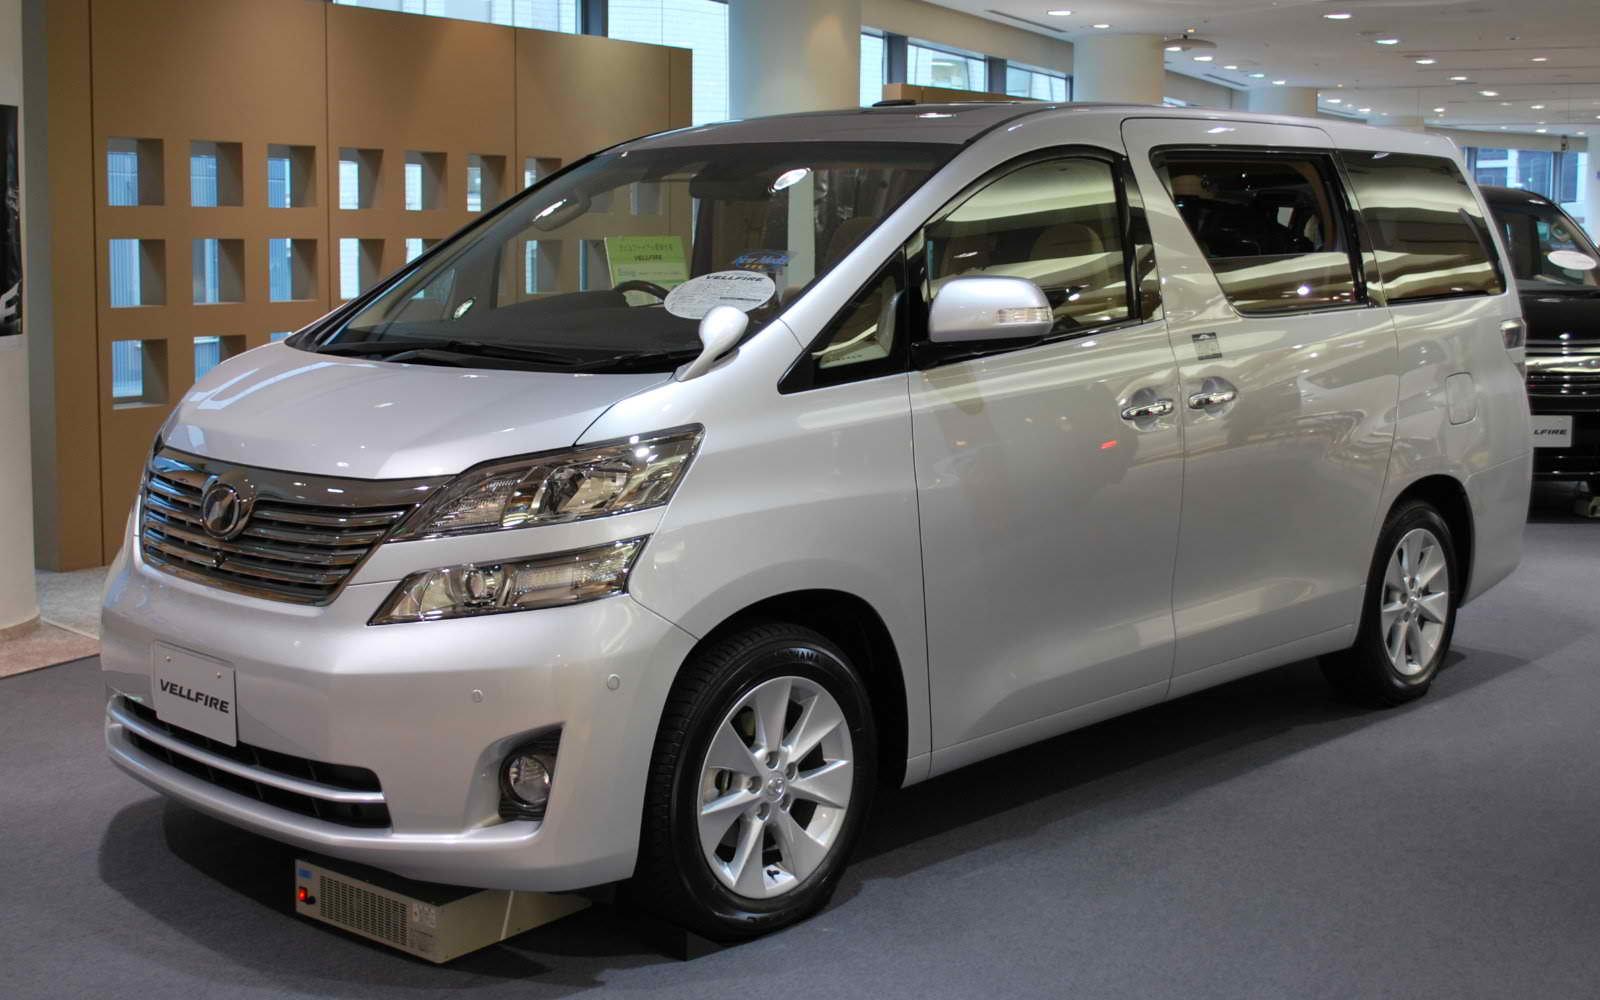 2012 Toyota Vellfire Picture Gallery : Automobile